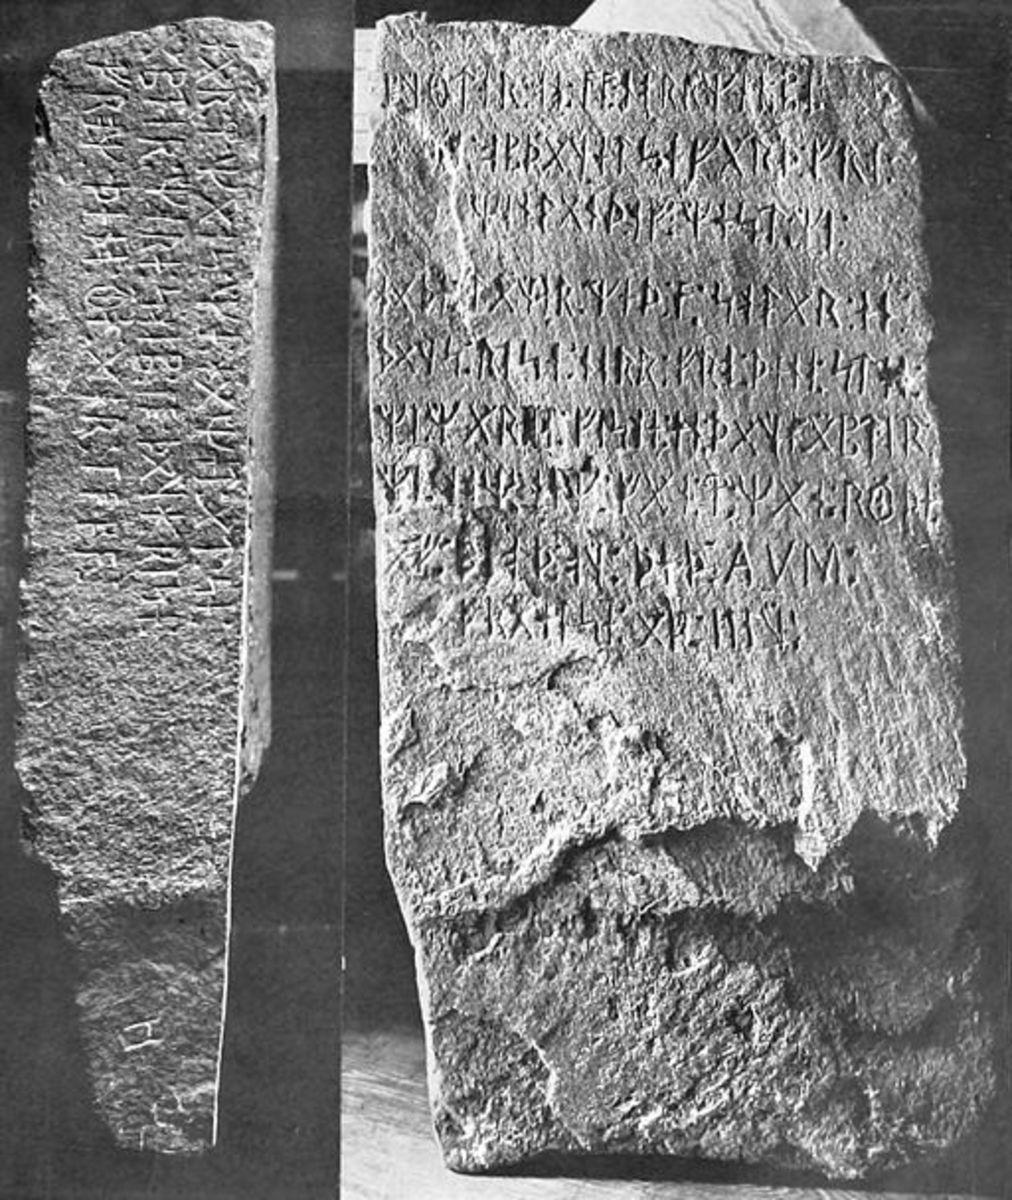 The Kensington Runestone Hoax